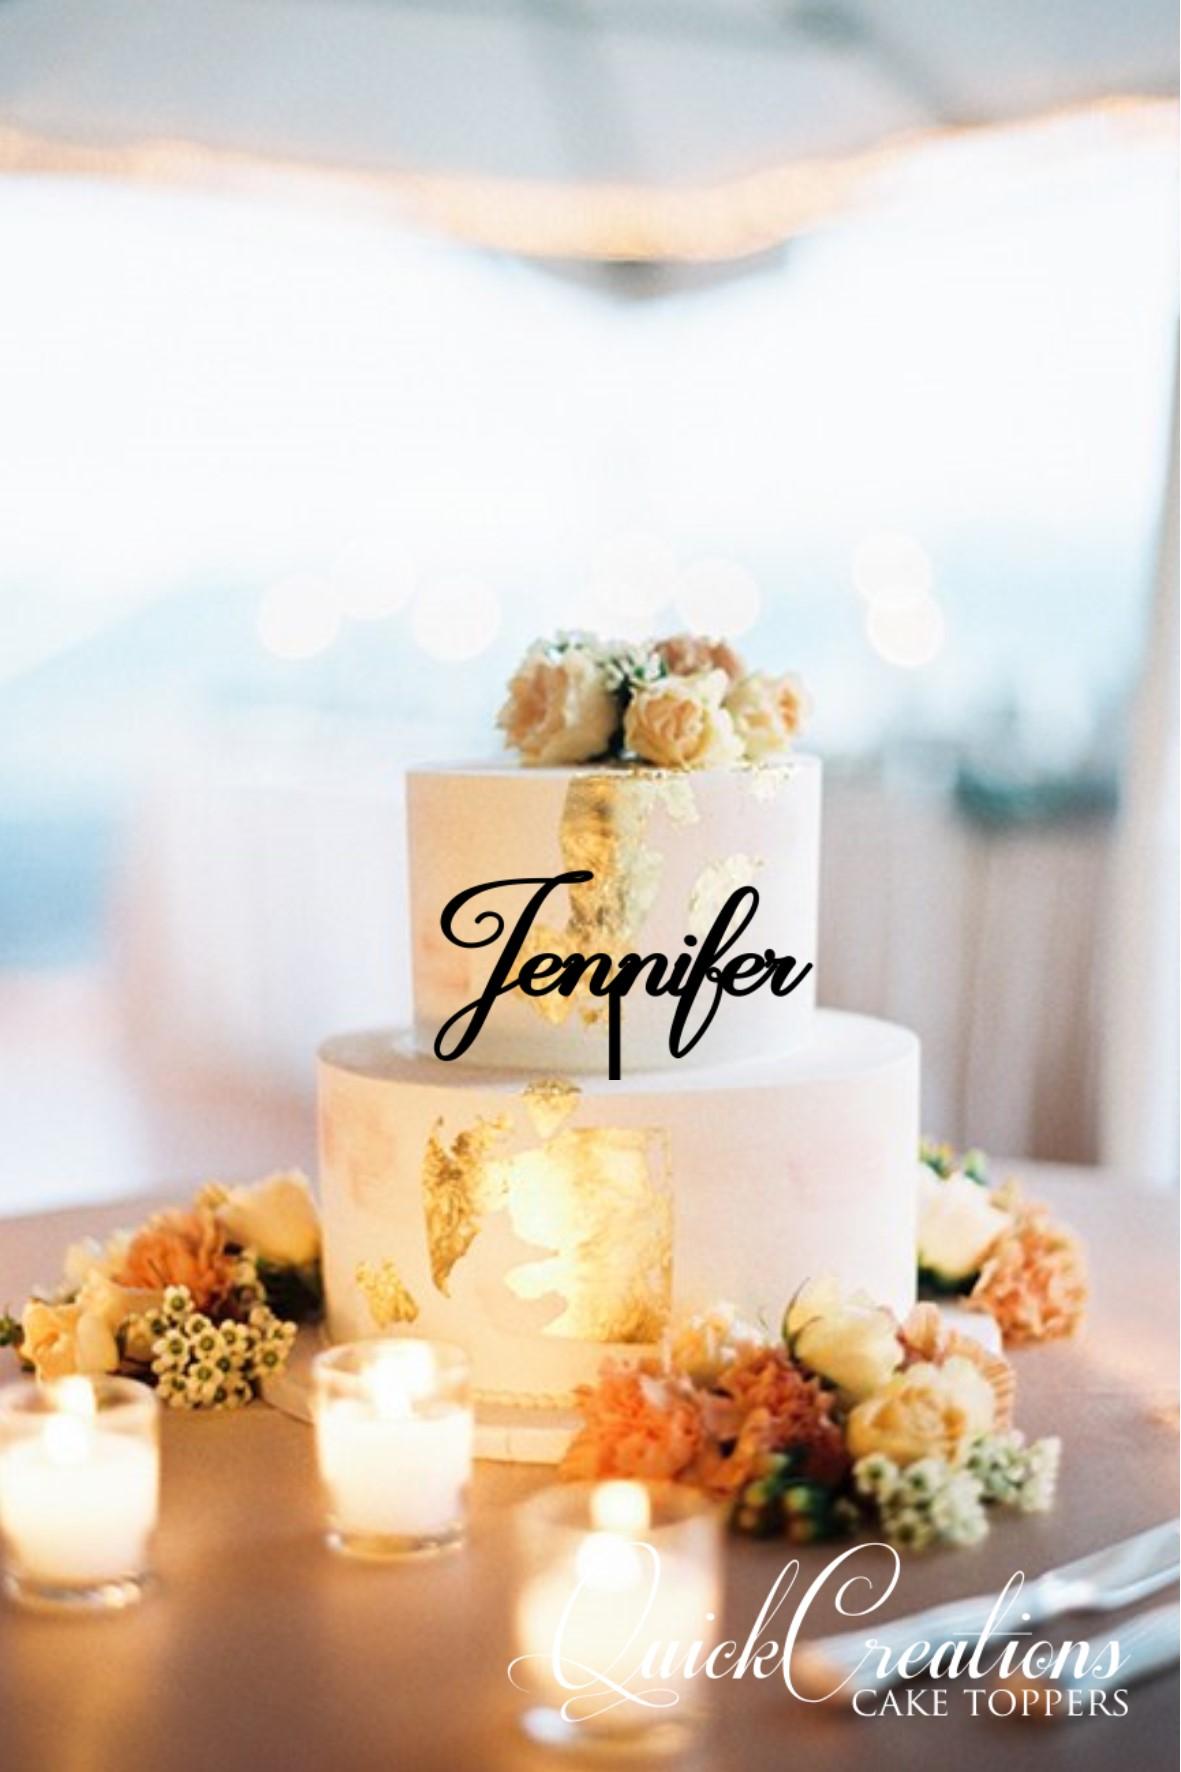 Quick Creations Cake Topper - Jennifer